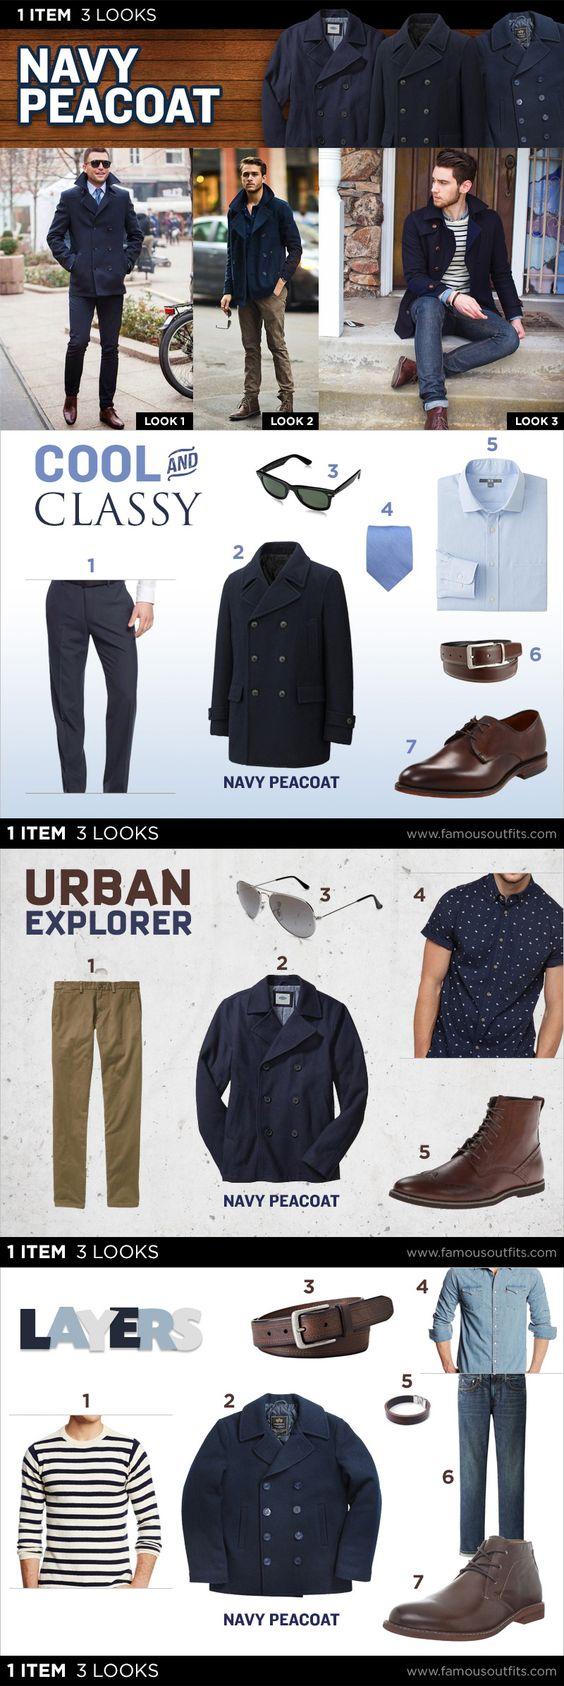 navy peacoat 1 item 3 looks pinterest mode homme v tements et hommes. Black Bedroom Furniture Sets. Home Design Ideas